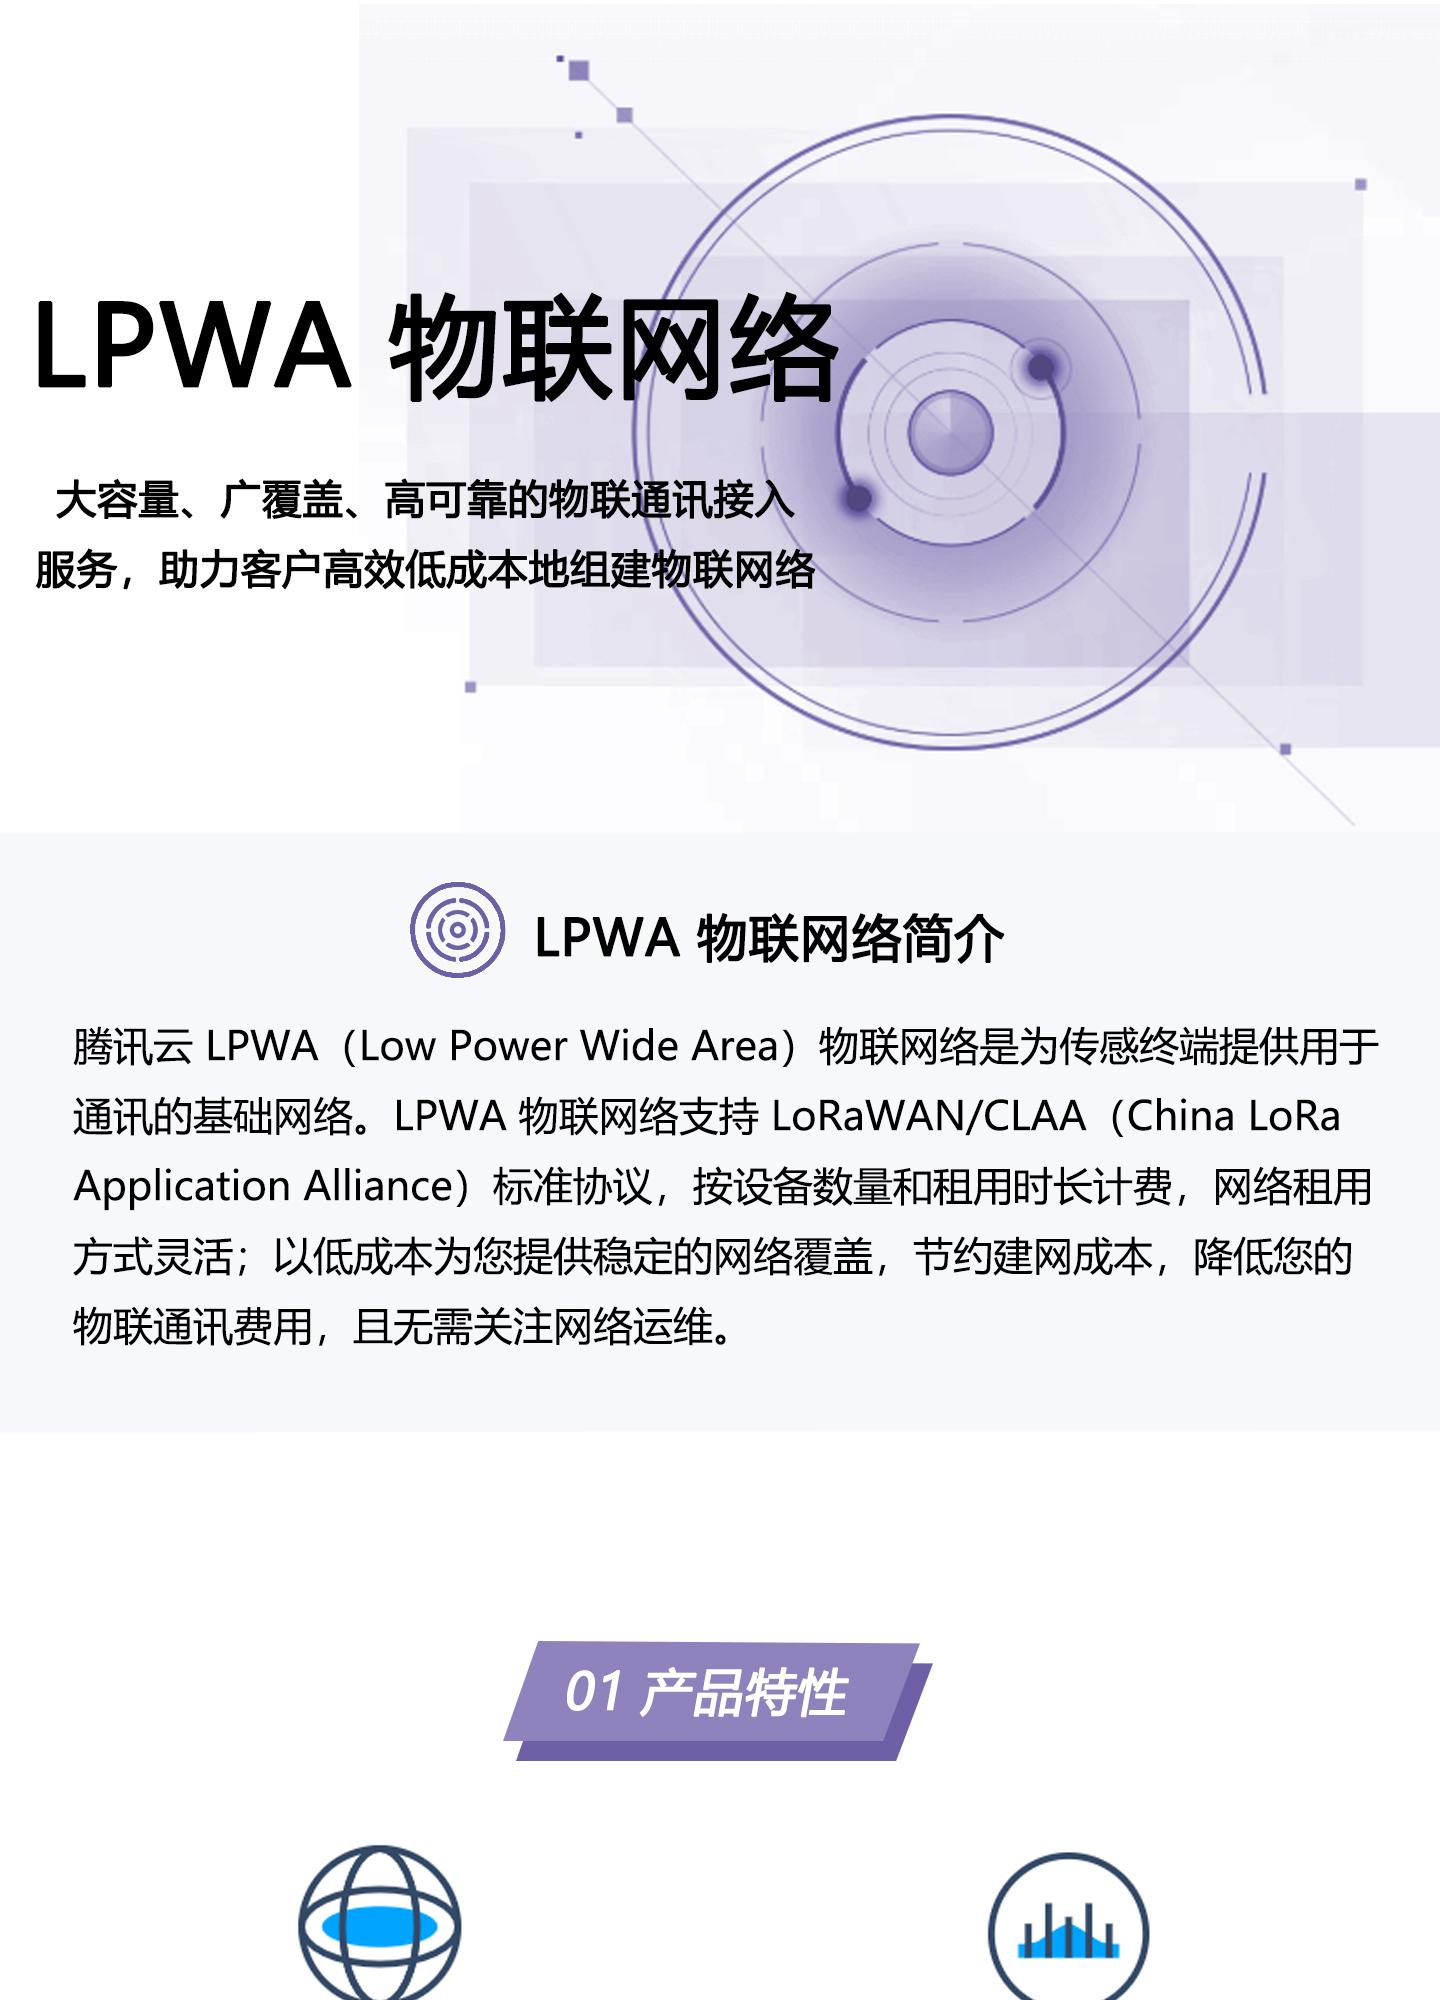 LPWA-物联网络1440_01.jpg